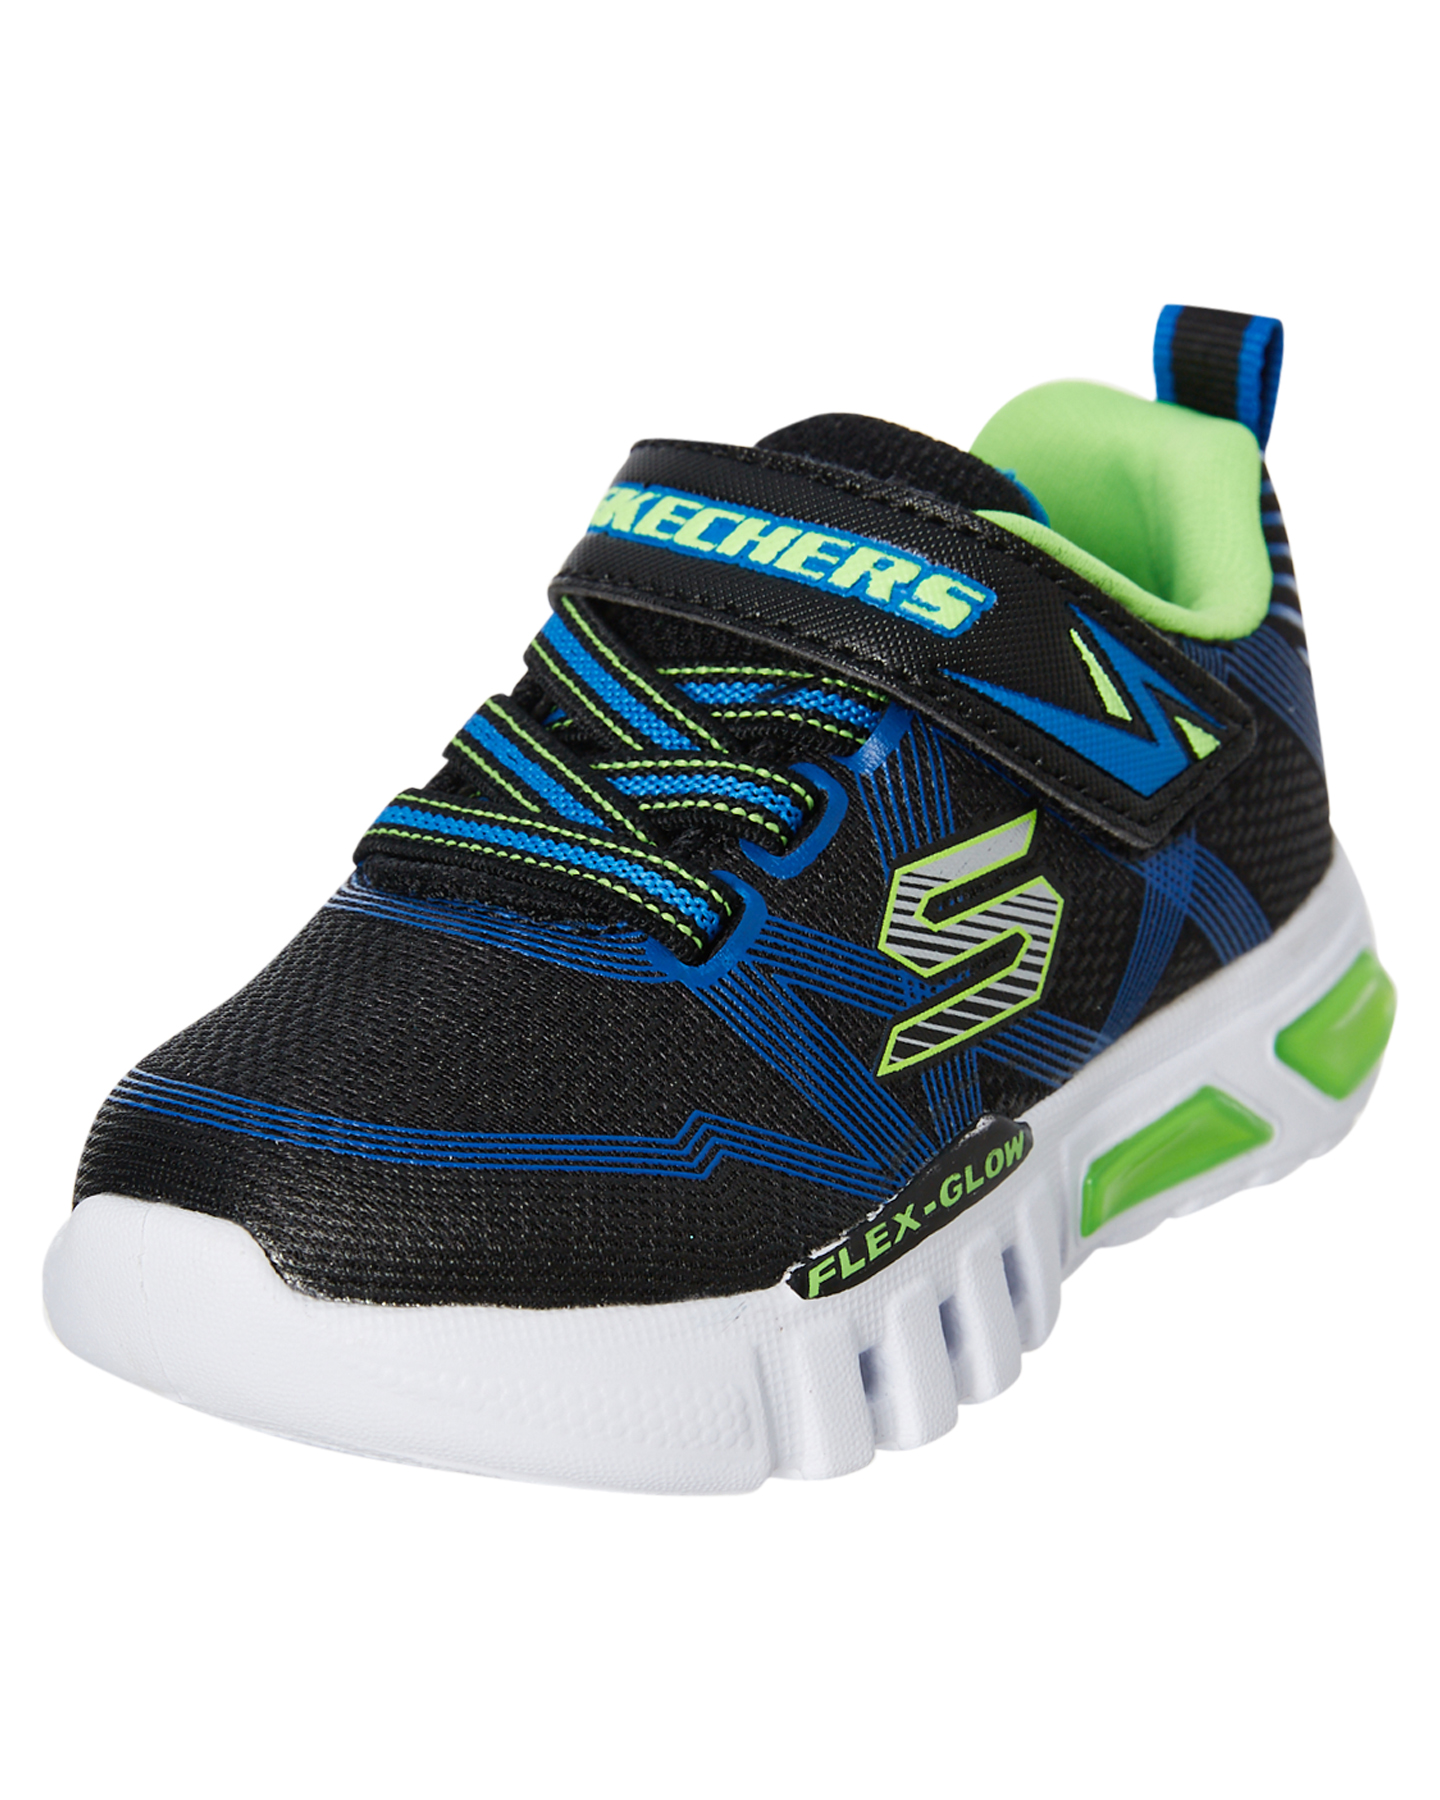 Skechers-Boys-Tots-Boys-Flex-Glow-Shoe-Lace-Mesh-Blue thumbnail 10